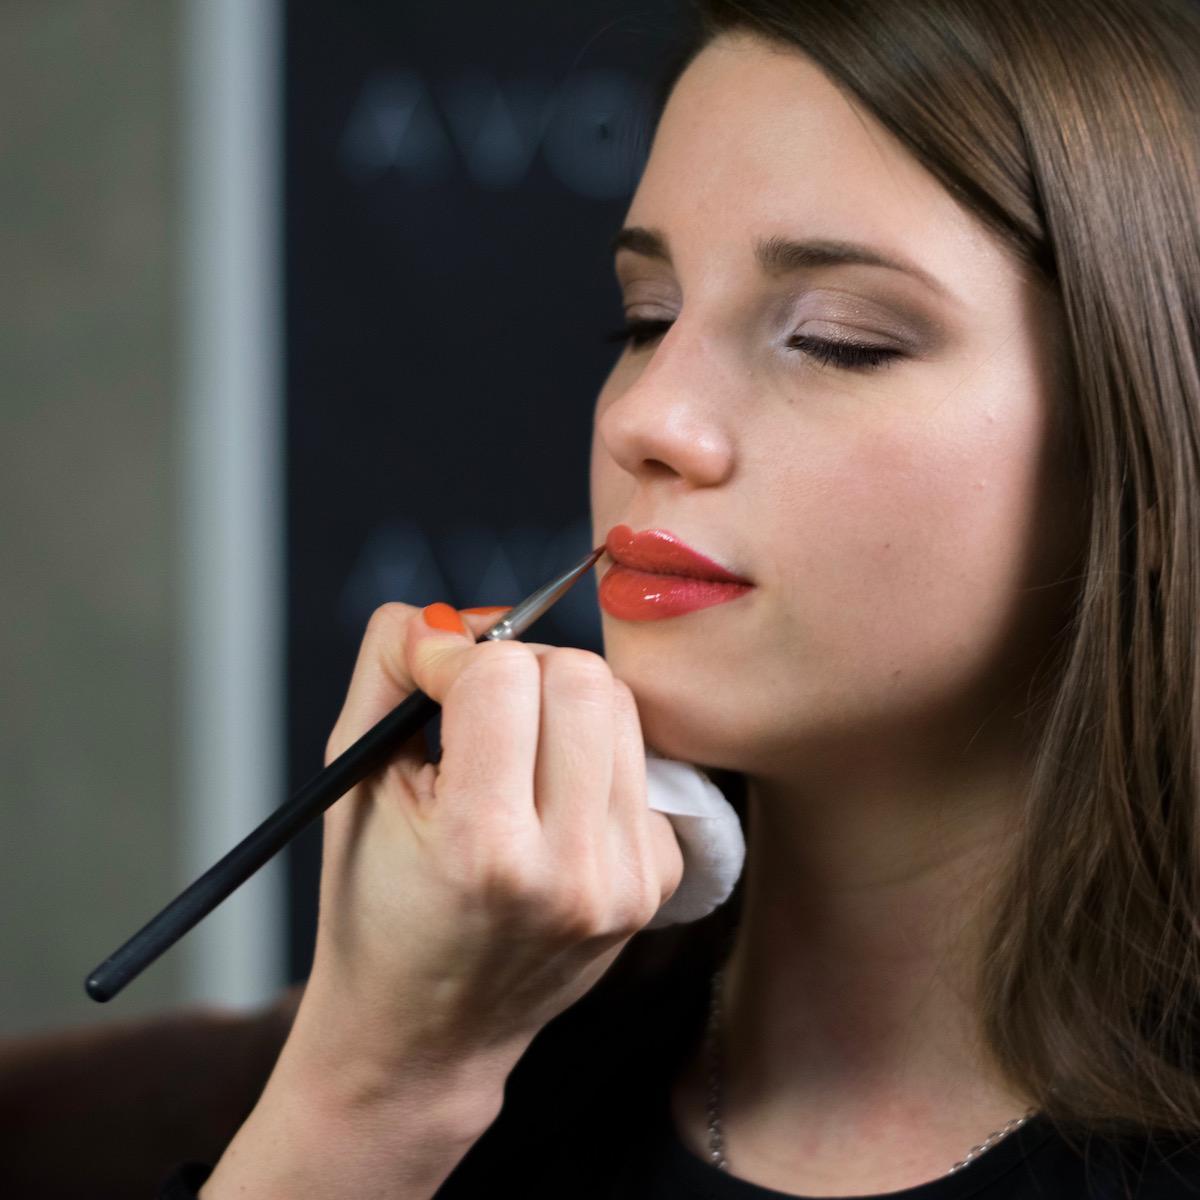 Avon Mark licila red lipstick rdeca sminka